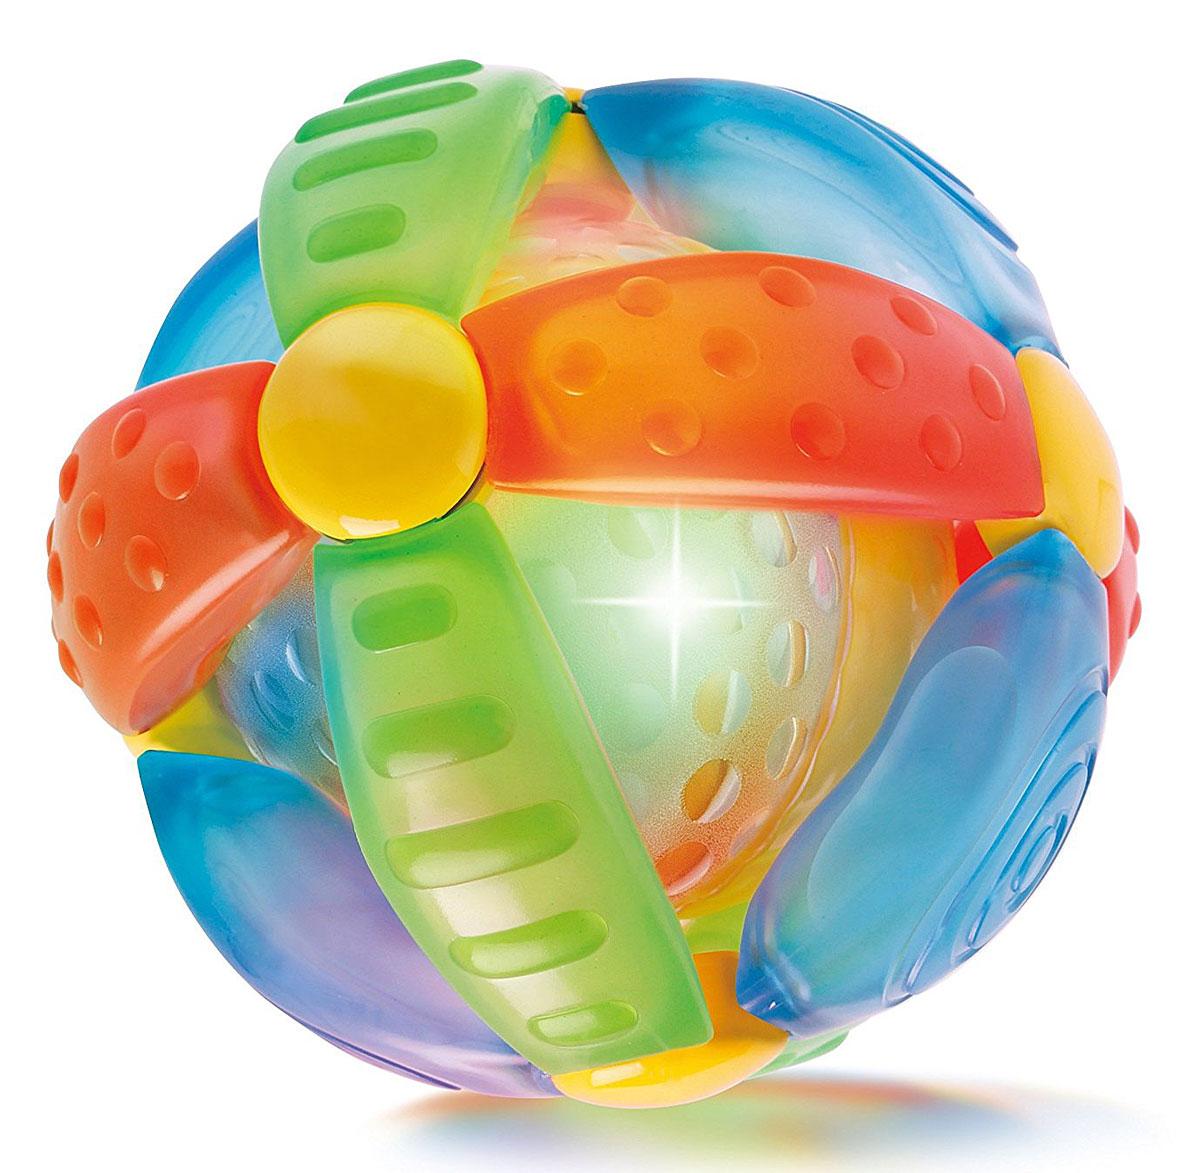 B kids Развивающая игрушка Шар-цветок игрушка черепашка b kids